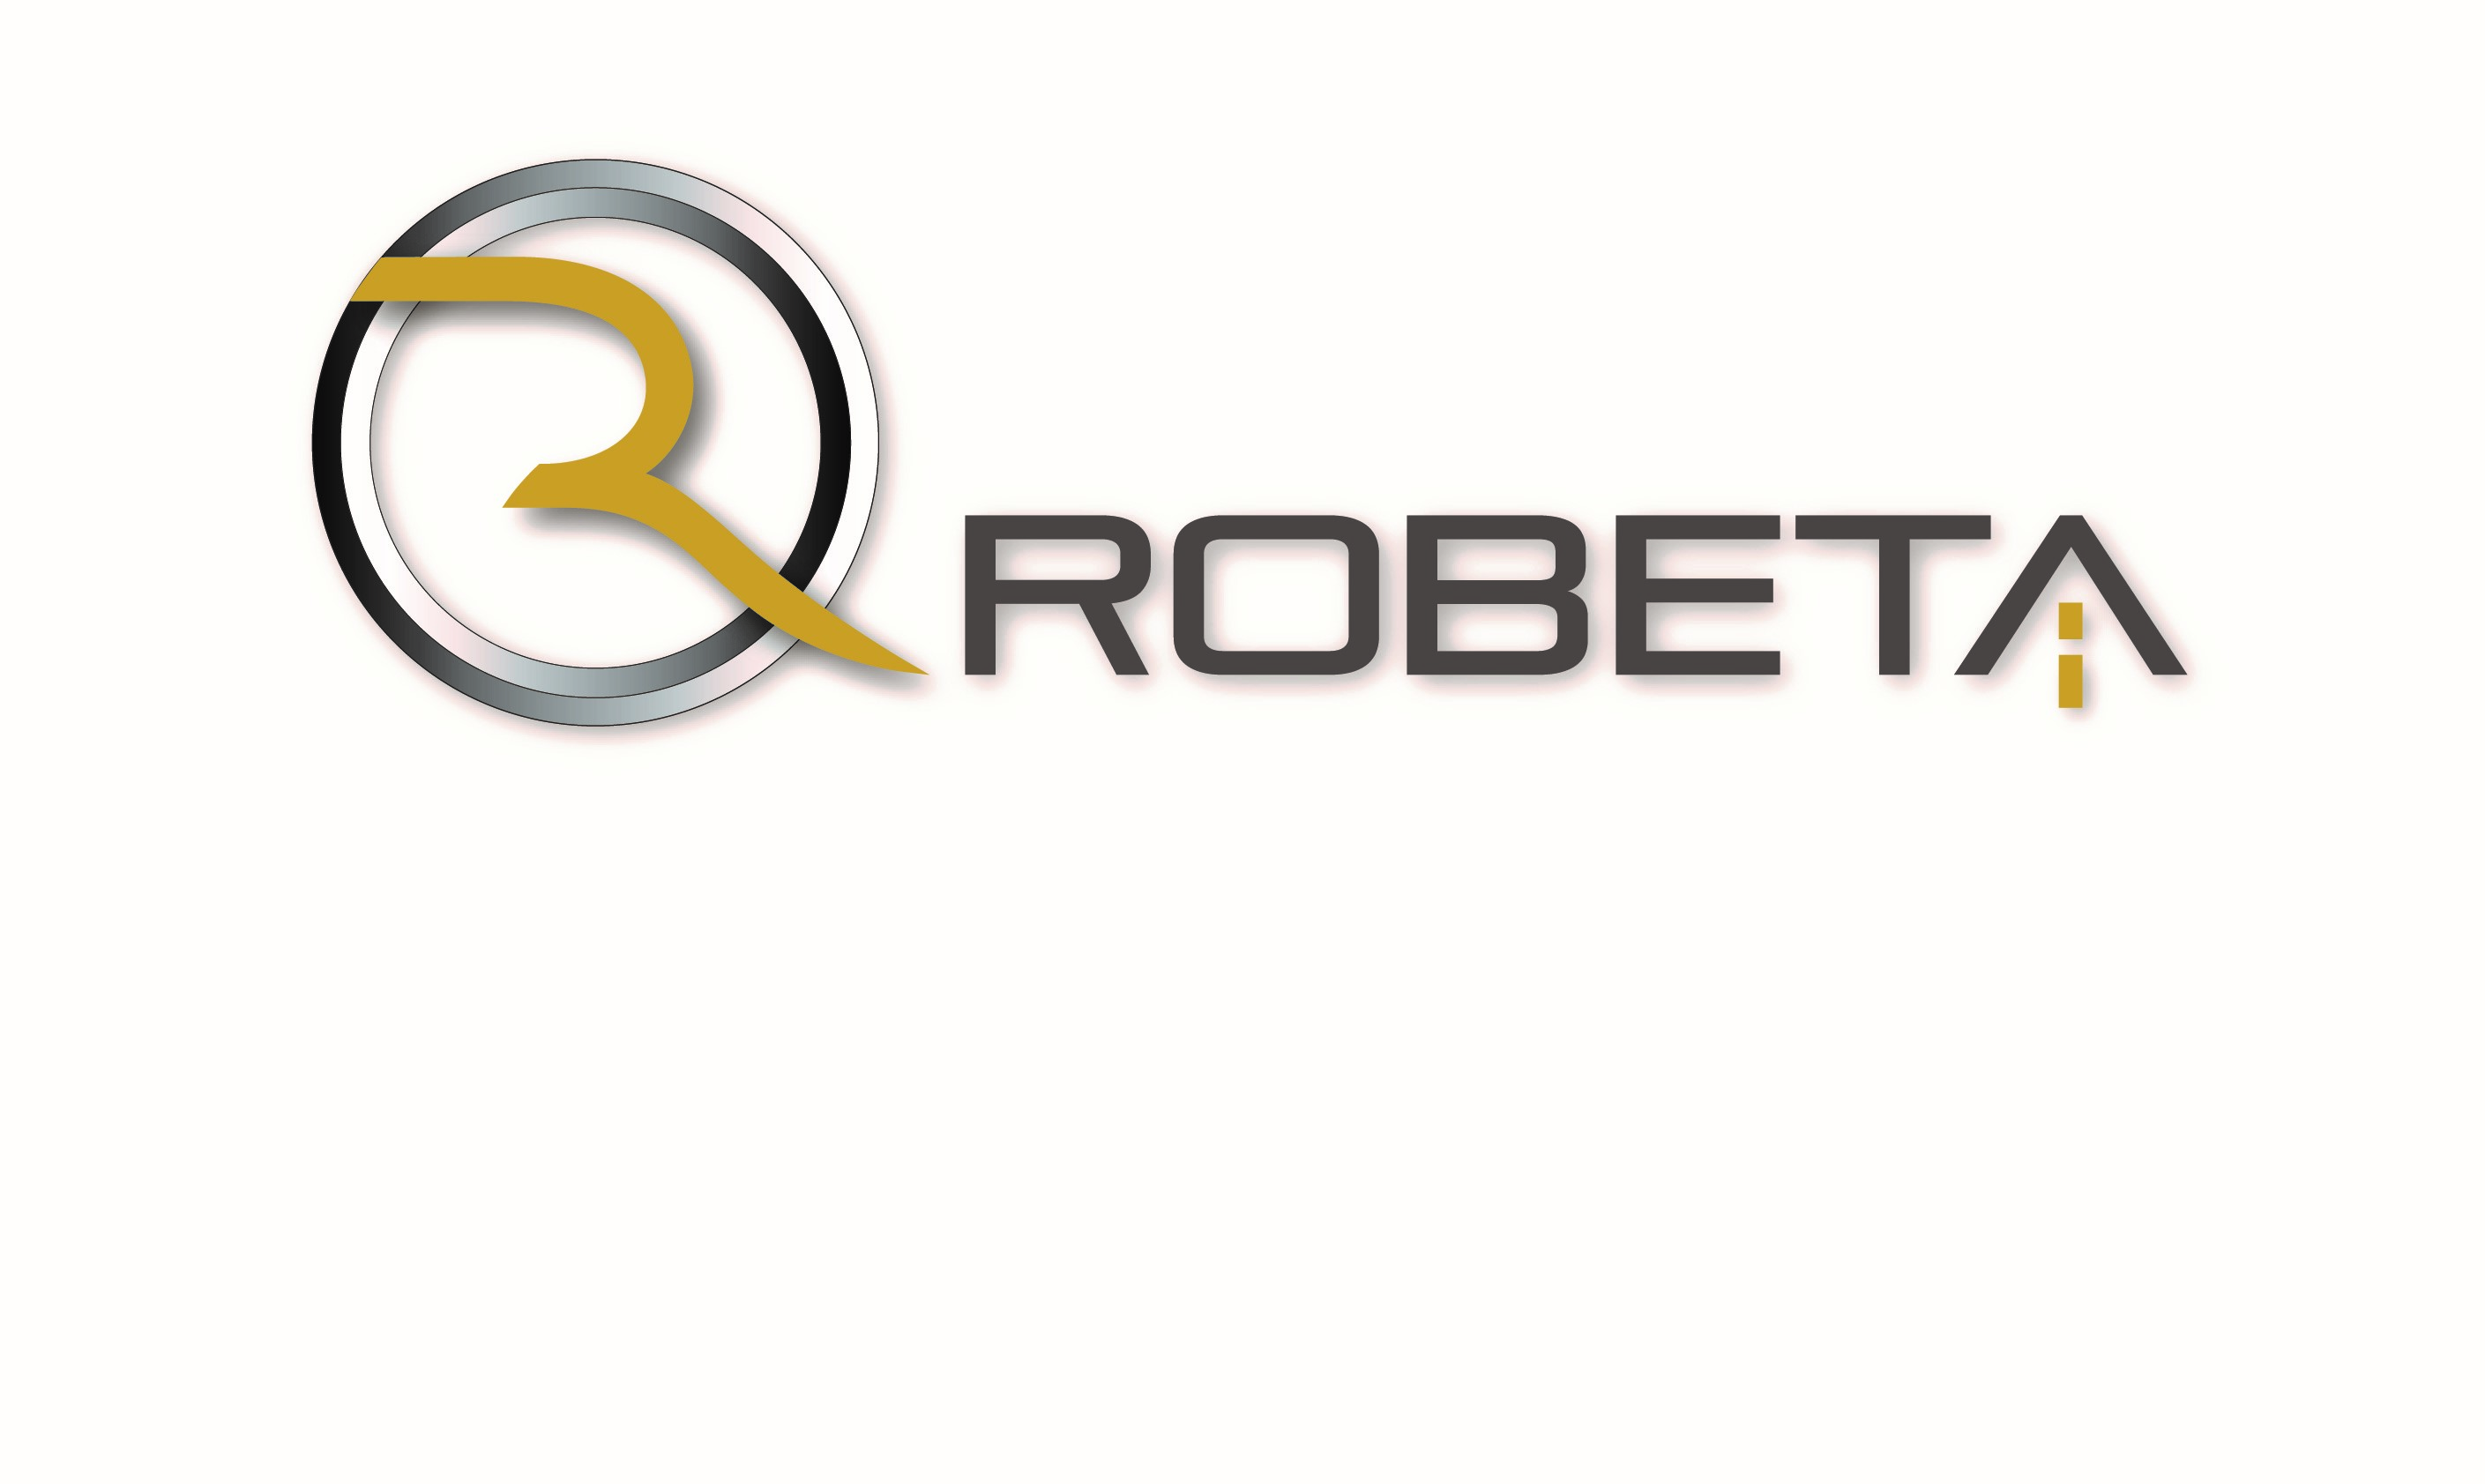 ROBETA LOGO_all-02 (2)